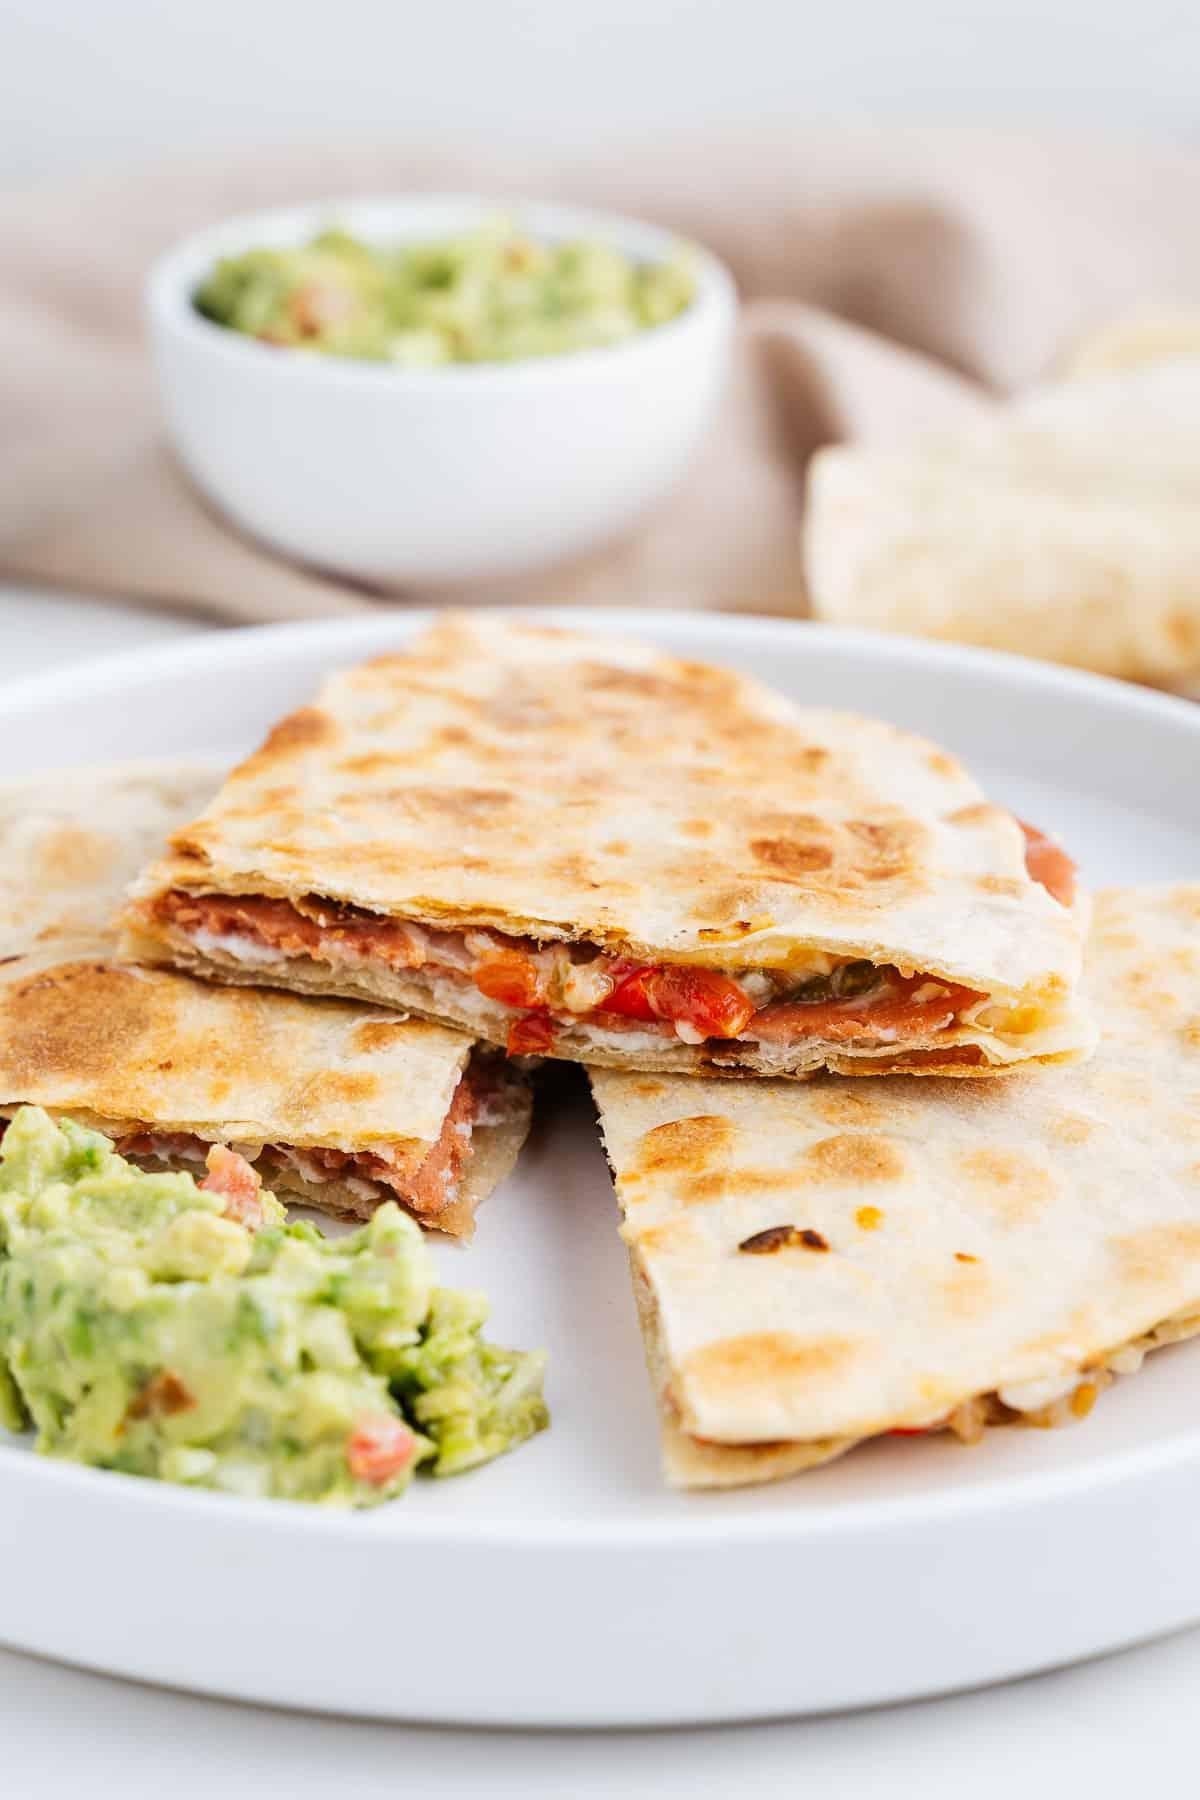 Vegan Sincronizadas With Guacamole